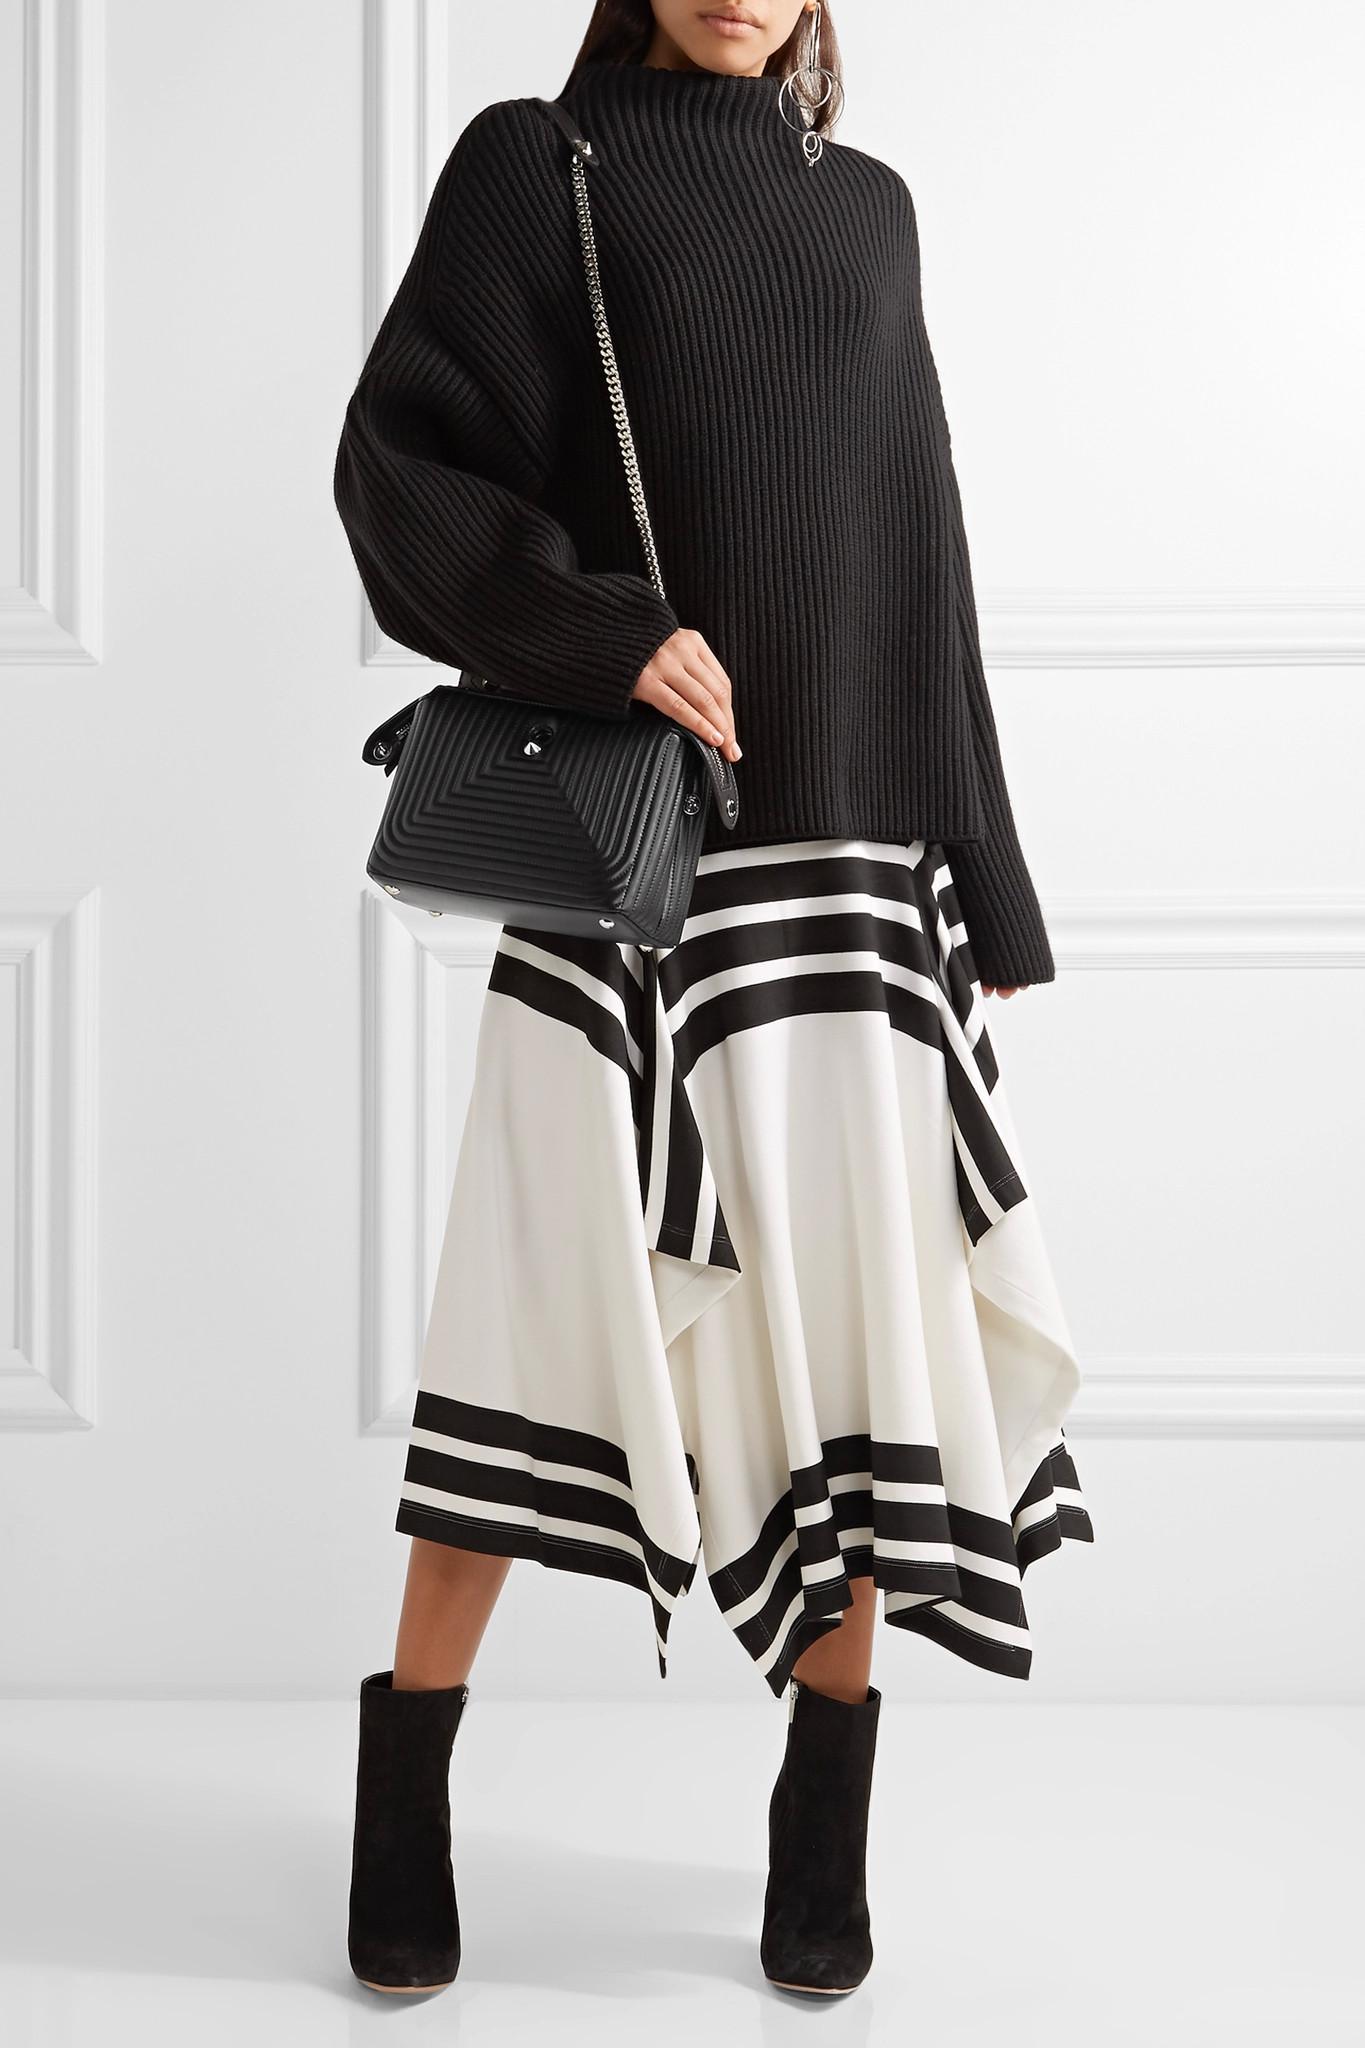 0233cd21103d Lyst - Fendi Dotcom Click Quilted Leather Shoulder Bag in Black